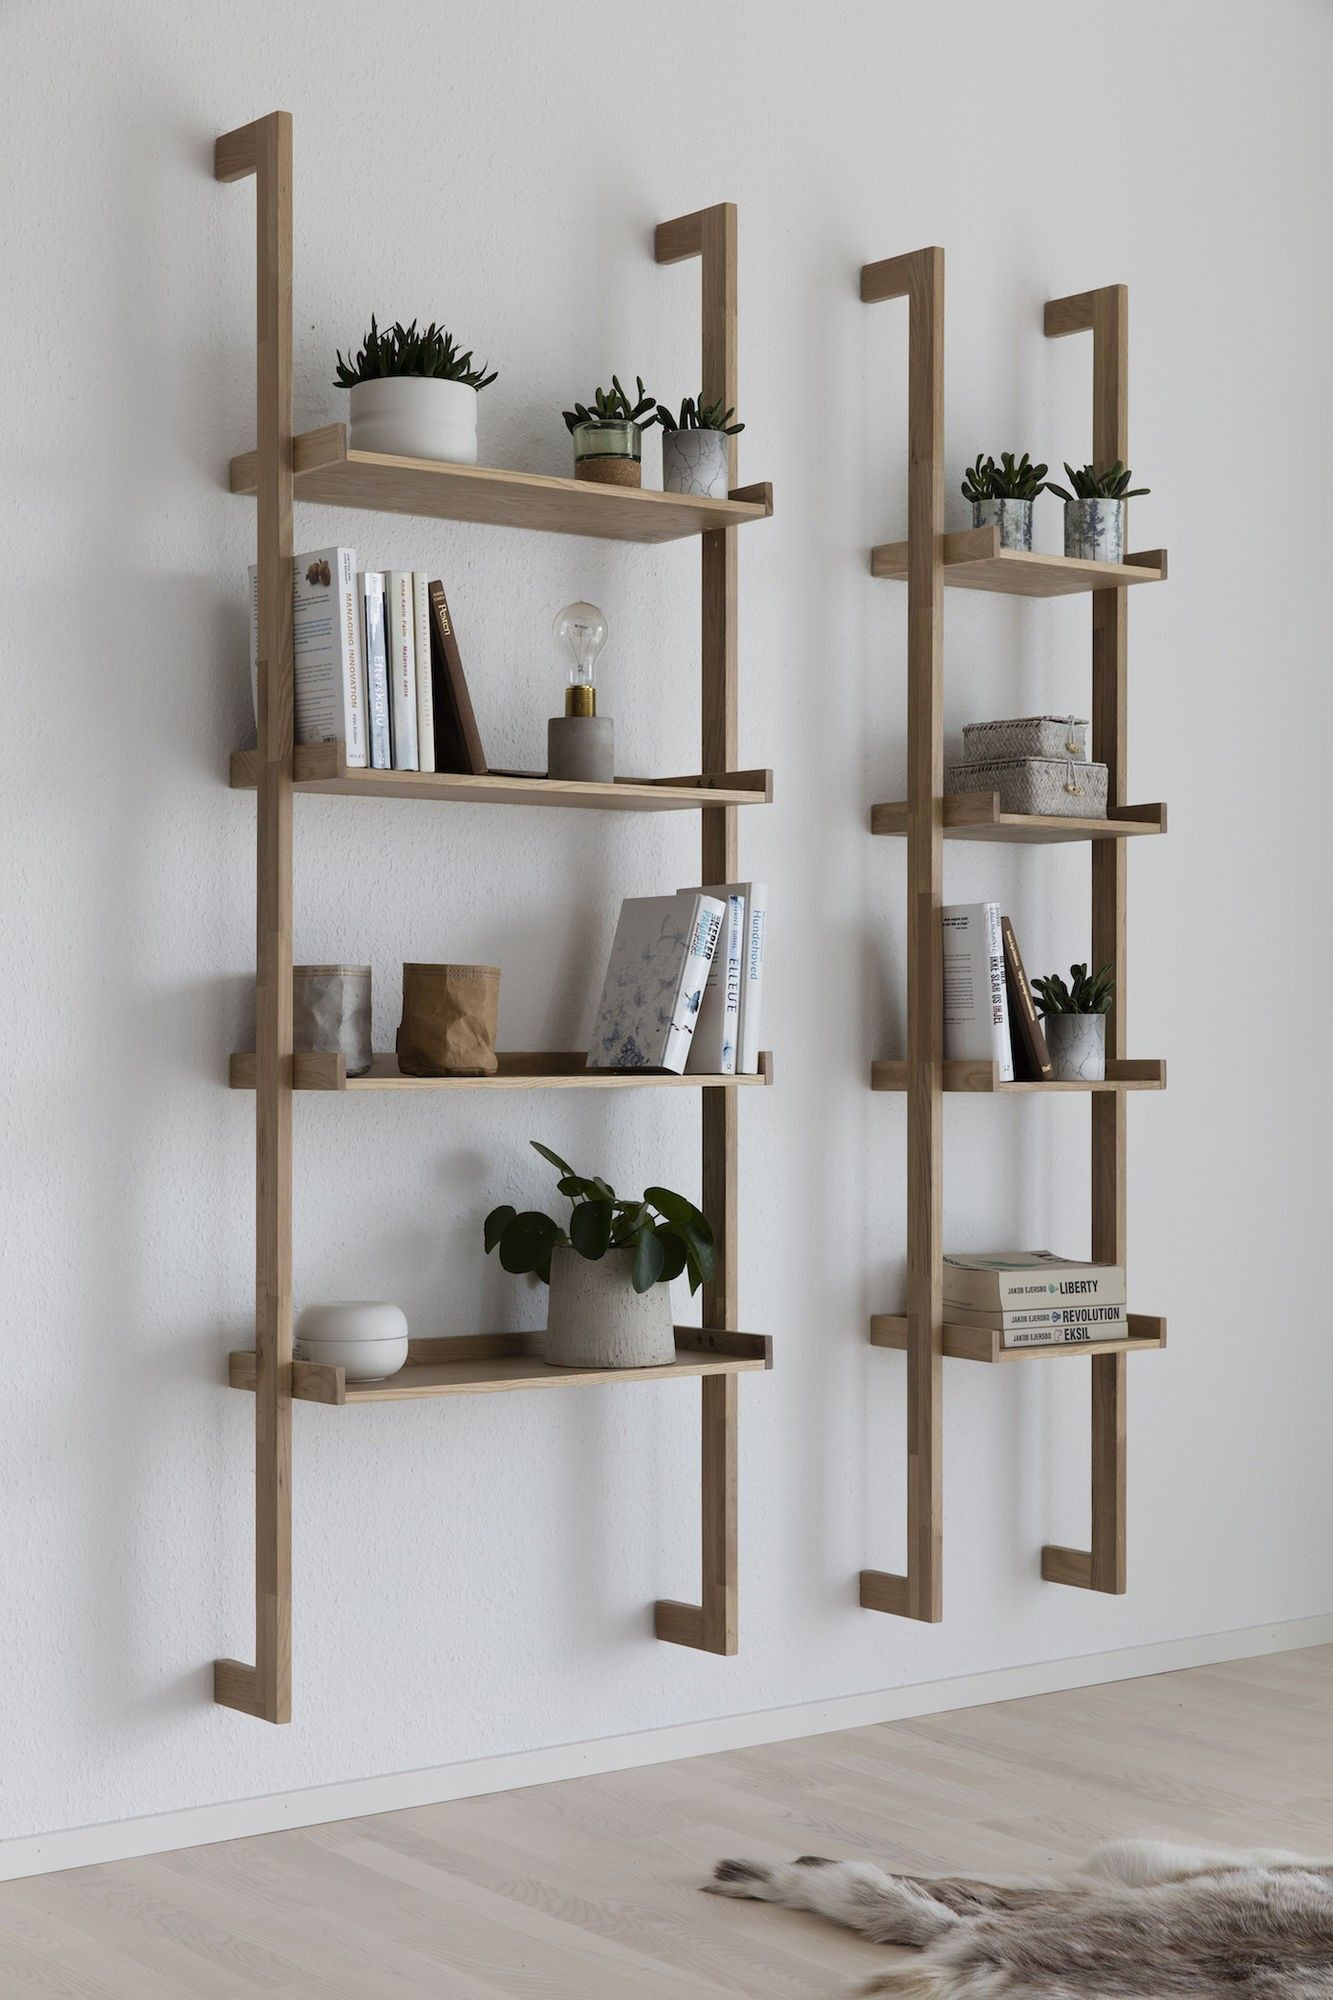 Boekenkast ladder sem mounted smal in home is where i